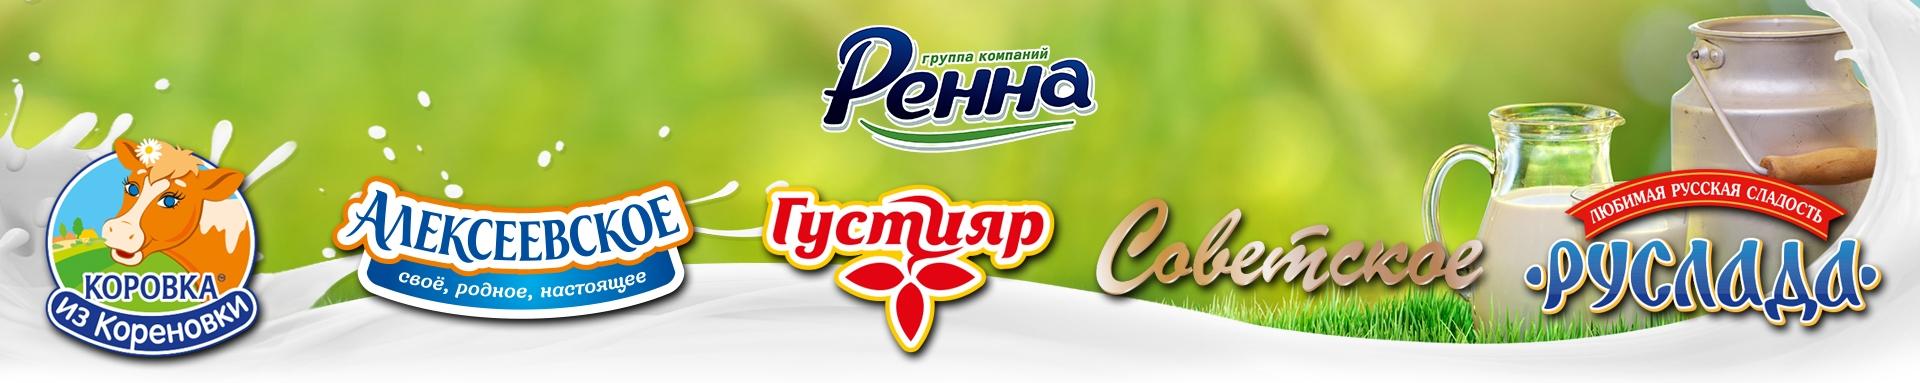 RENNA  Group of Companies